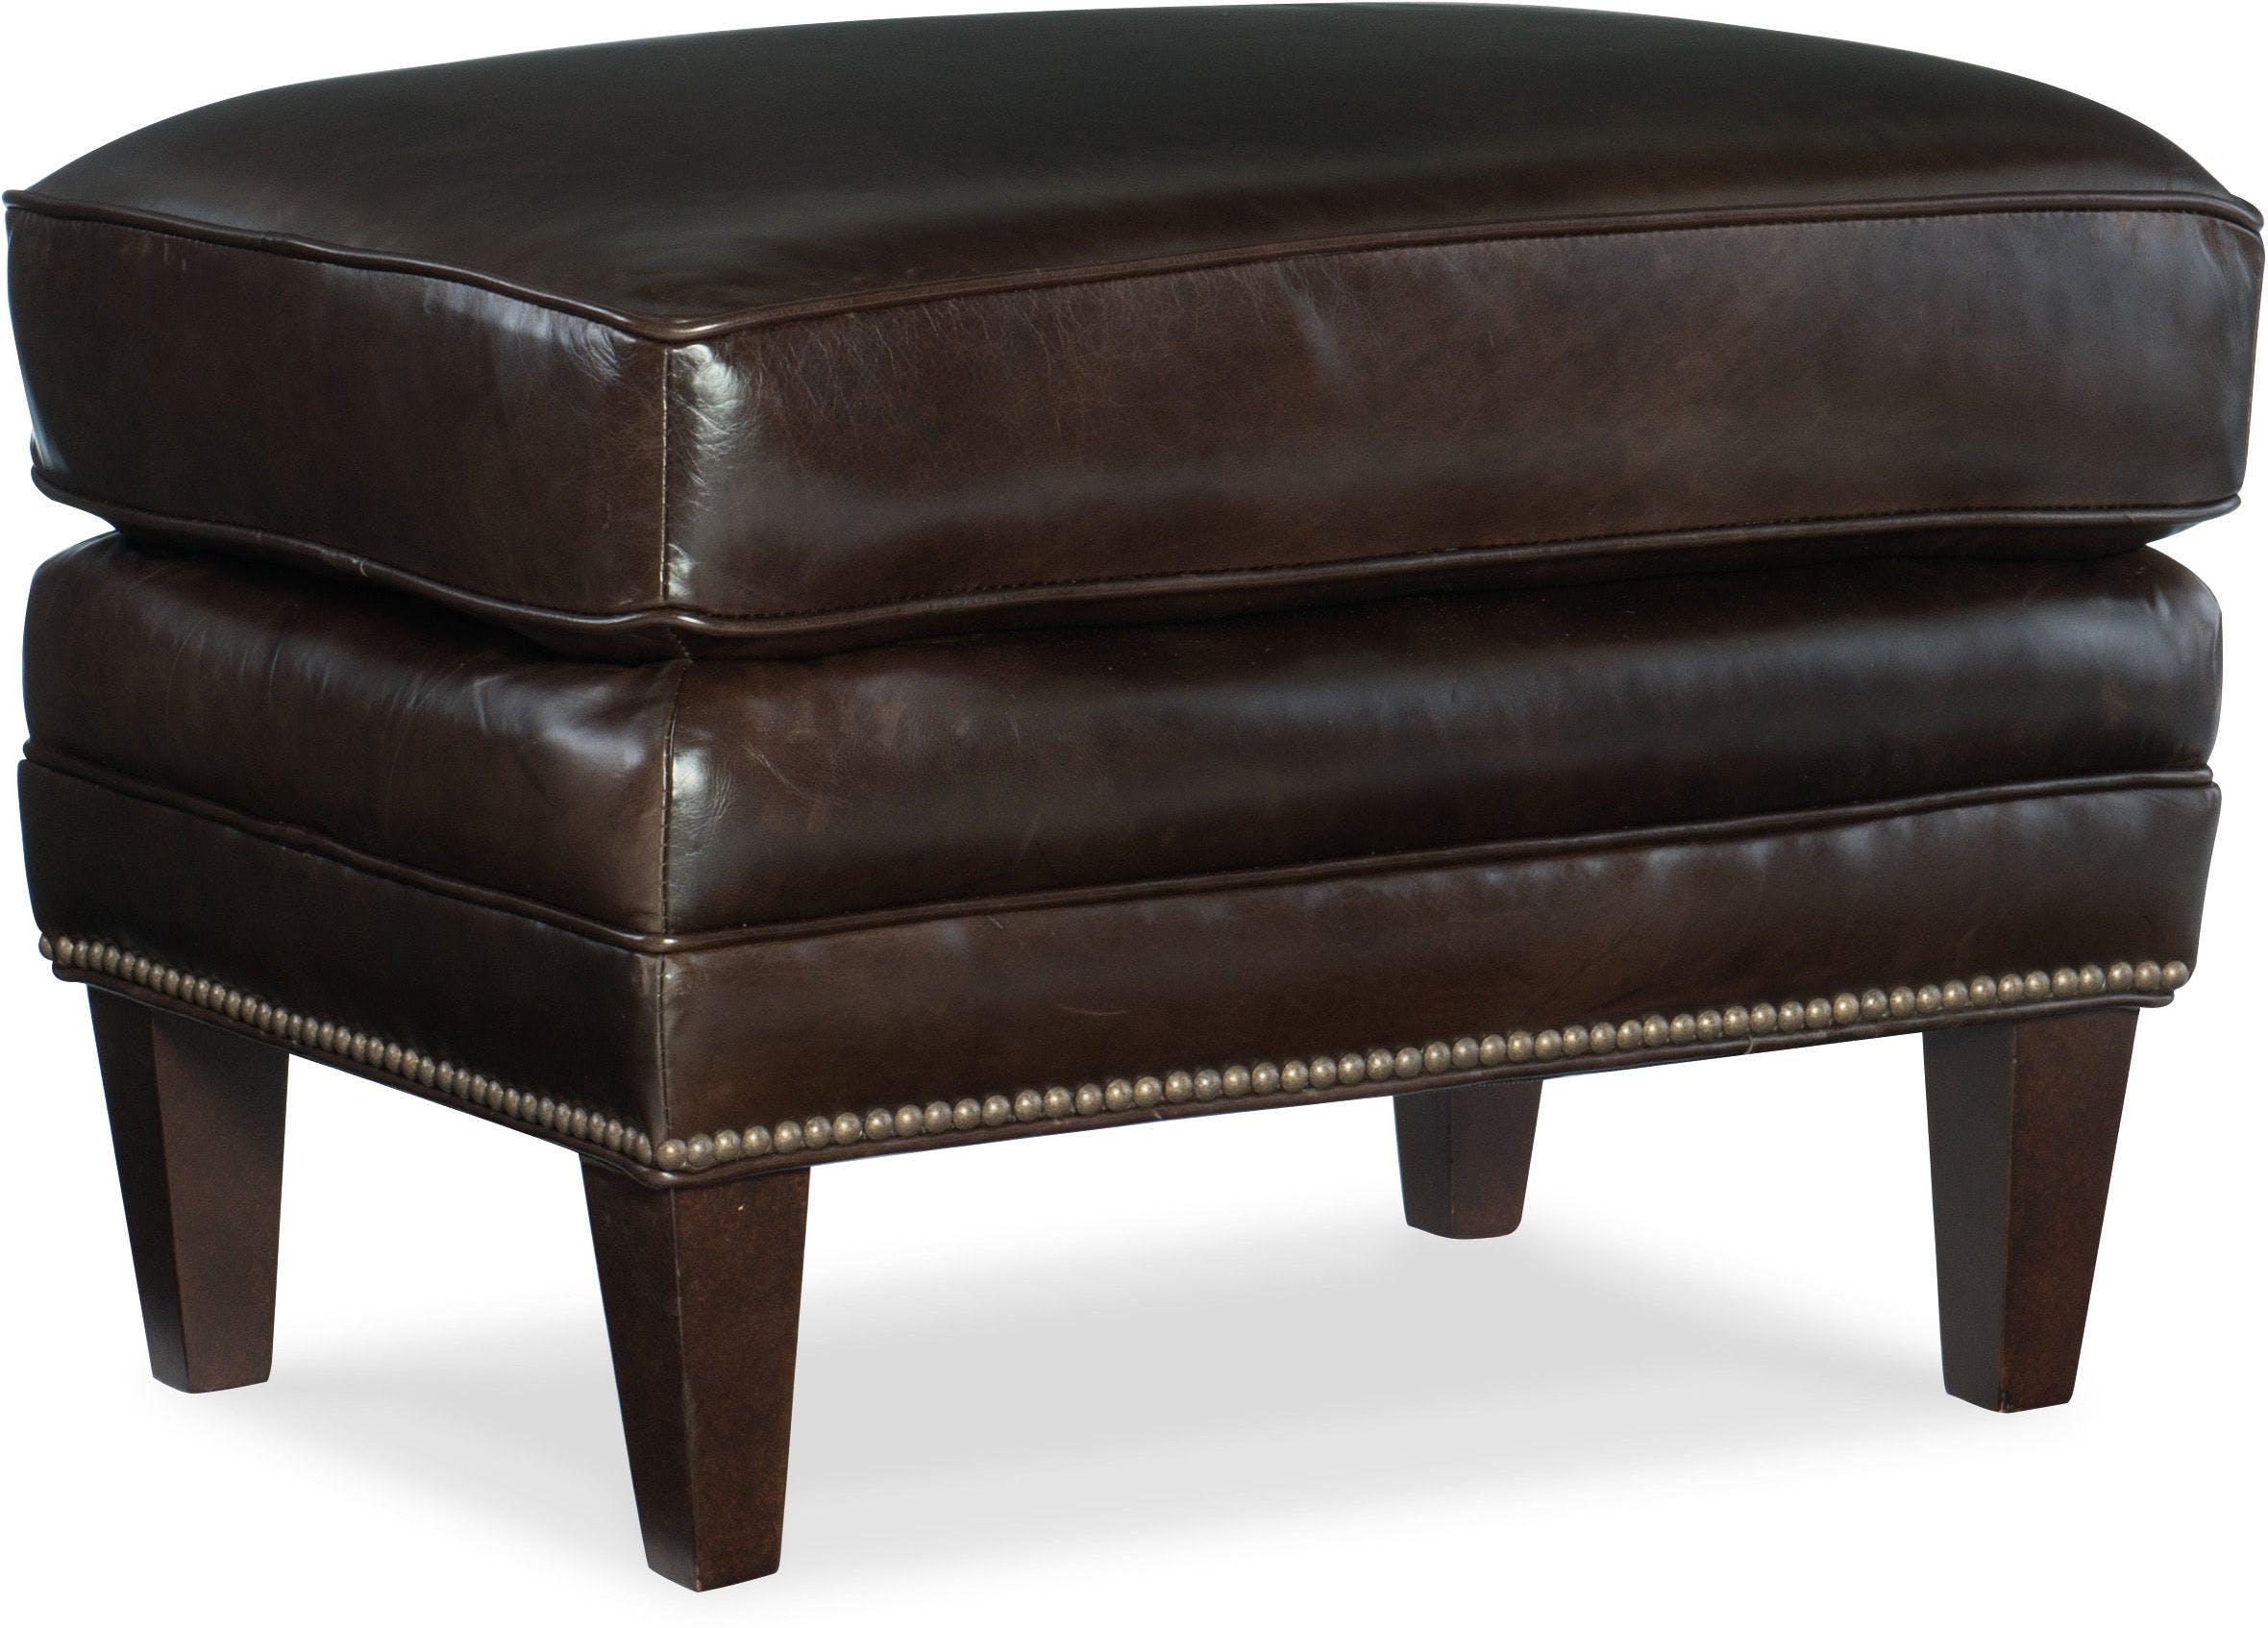 Enjoyable Austin Leather Sofa Sofas And Sectionals Machost Co Dining Chair Design Ideas Machostcouk